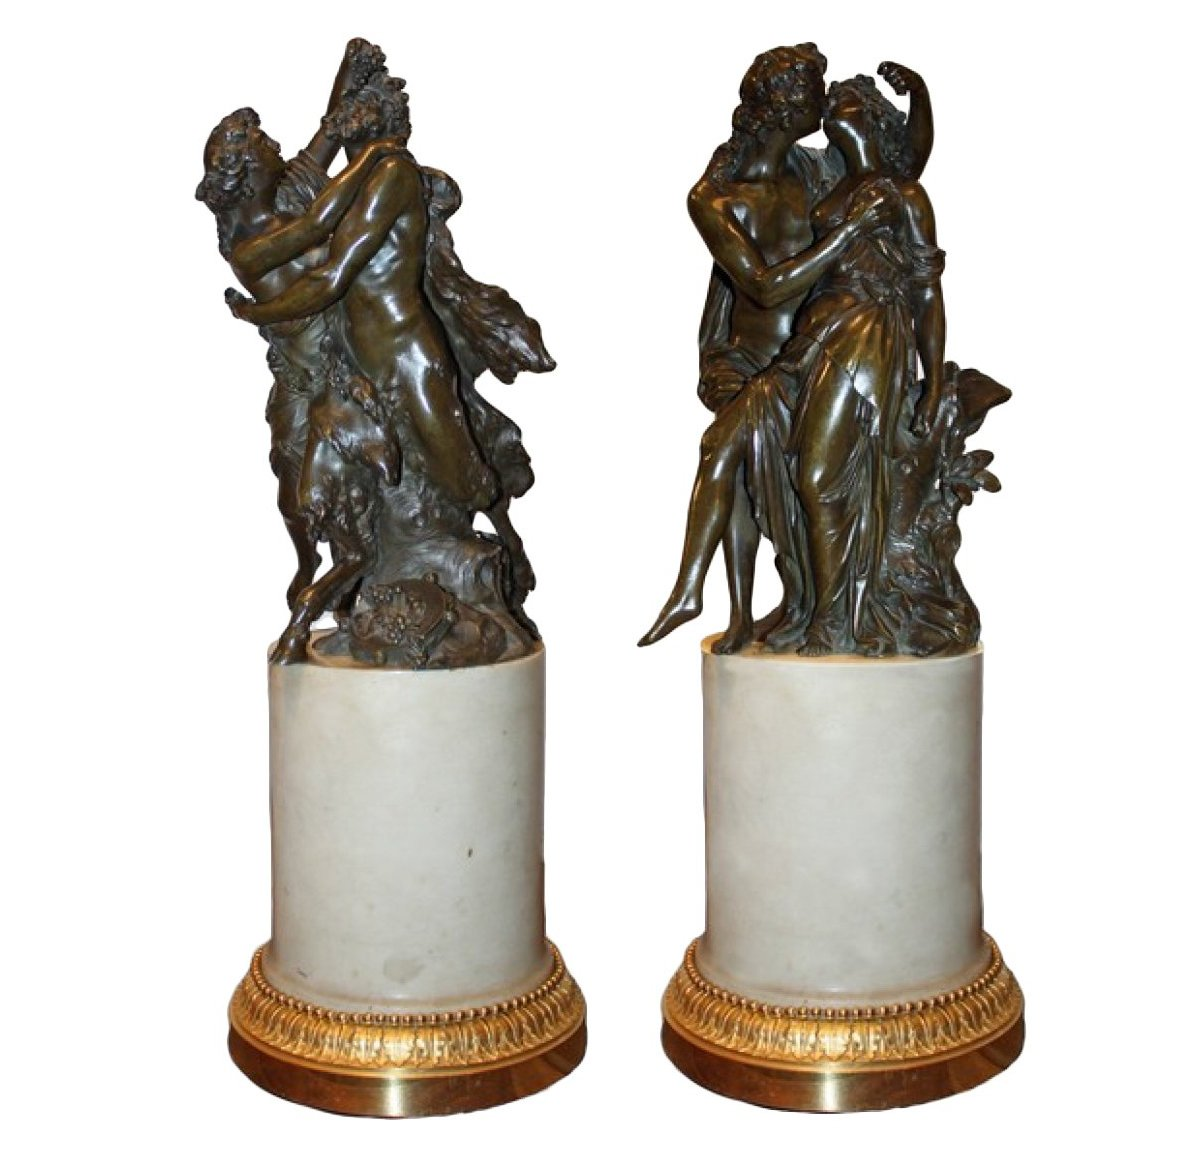 Paire De Groupes En Bronze  U00e0 Patine Brune  Attribu U00e9e  U00e0 J